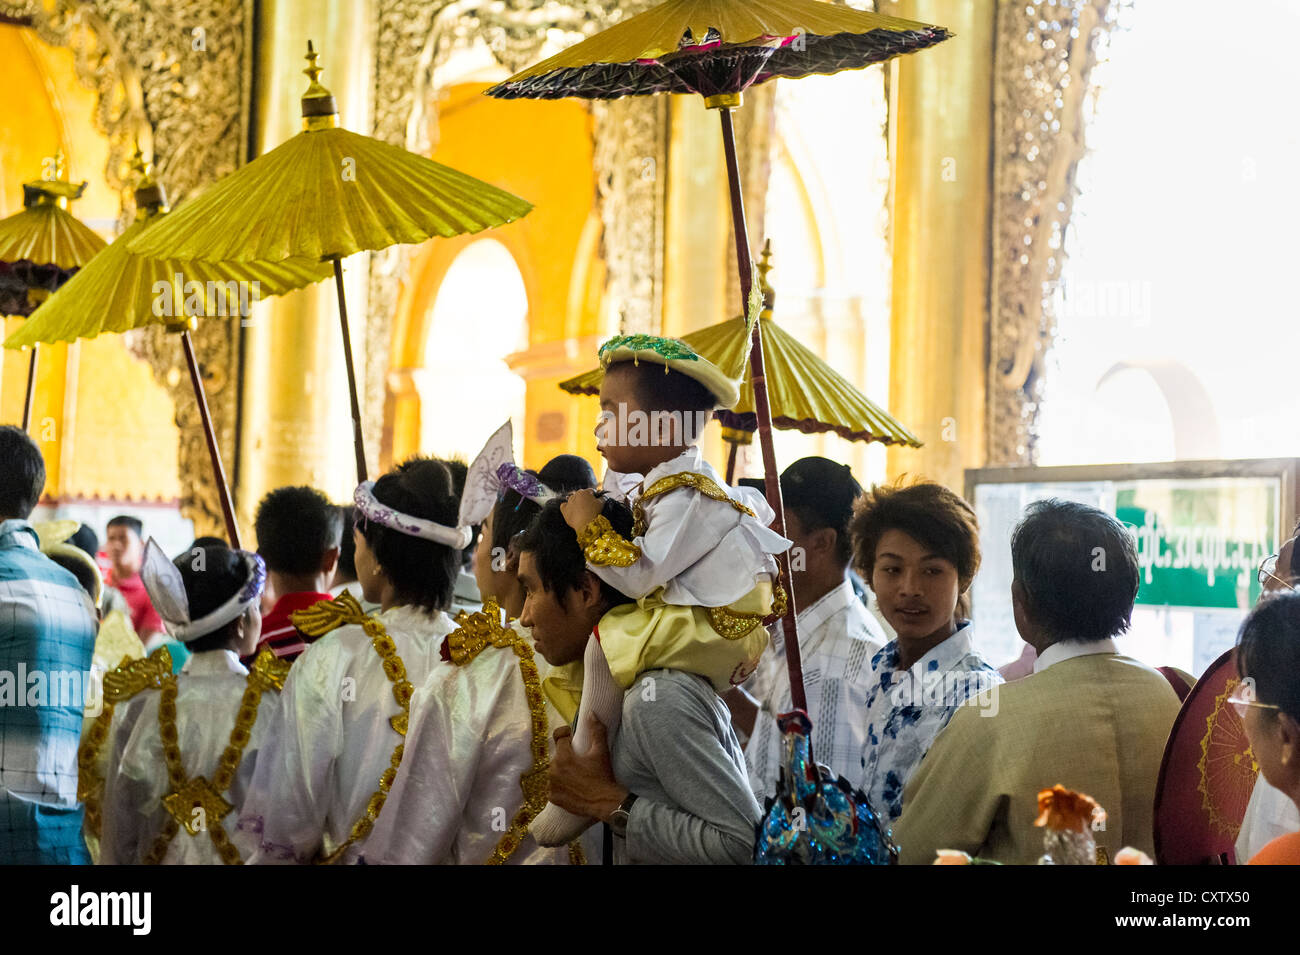 Cerimonia del monaco novizio al Tempio del Buddha Mahamuni a Mandalay. Myanmar Birmania Foto Stock